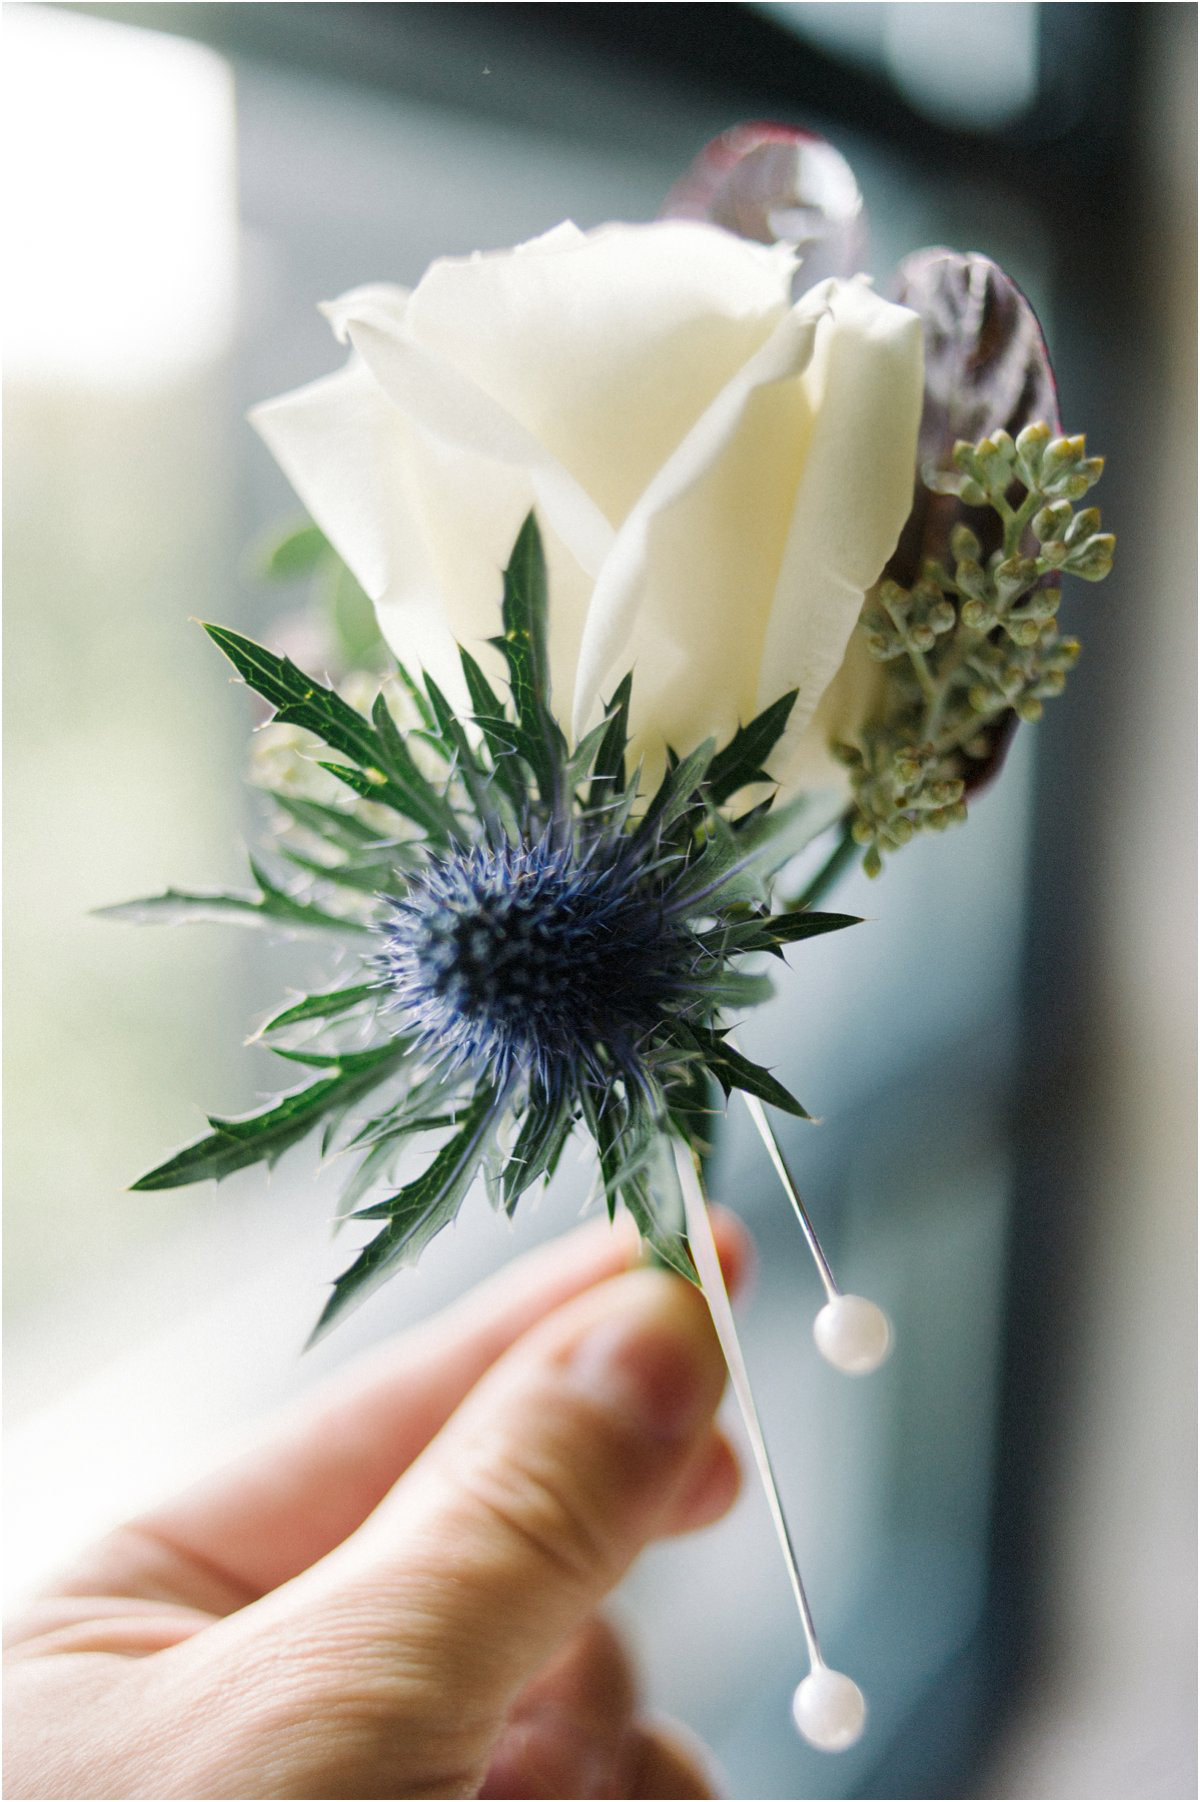 Crofts & Kowalczyk Best Wedding Photography Scotland Blogpost-128.jpg